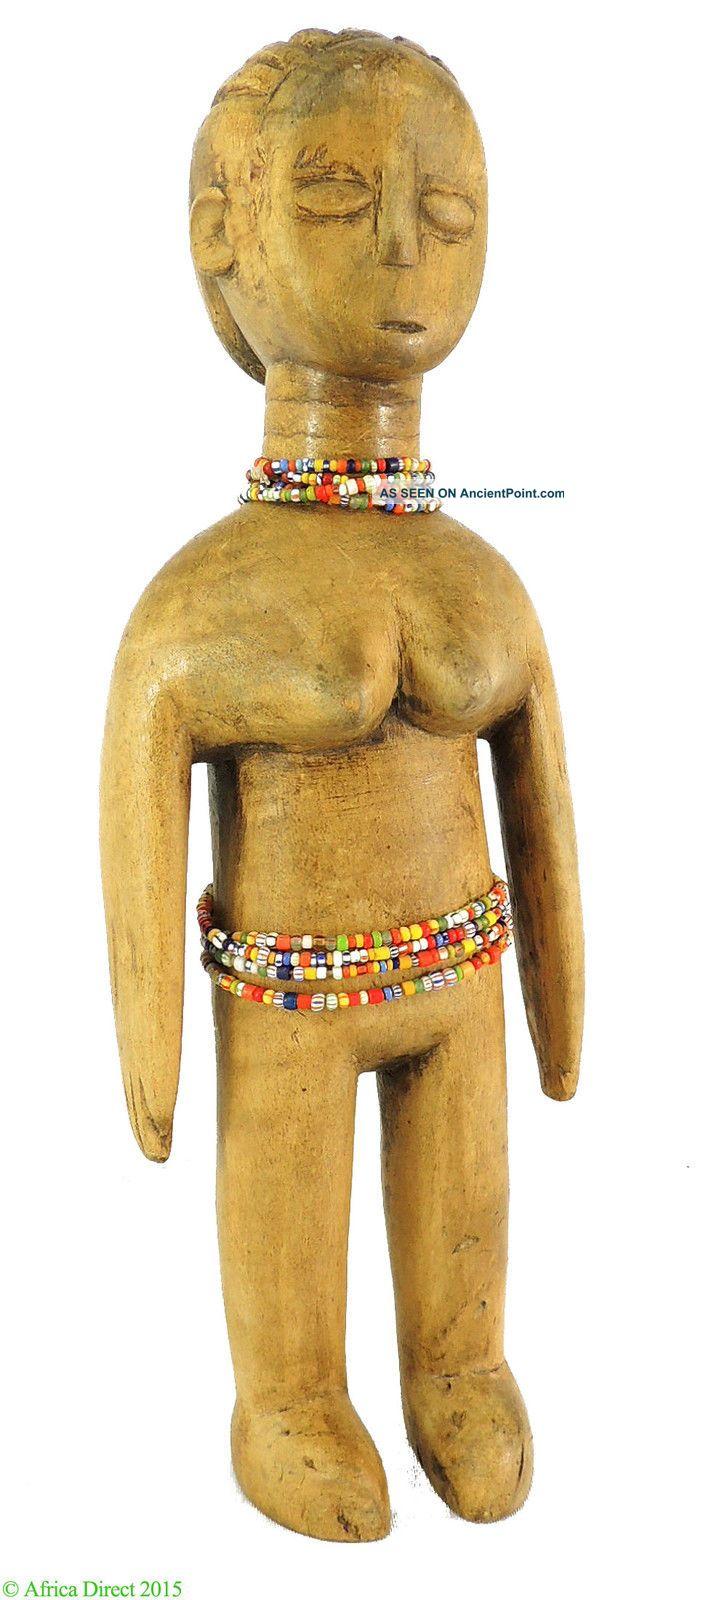 Ewe Doll Venovi Twin Figure Female Togo African Art Was $99 Sculptures & Statues photo